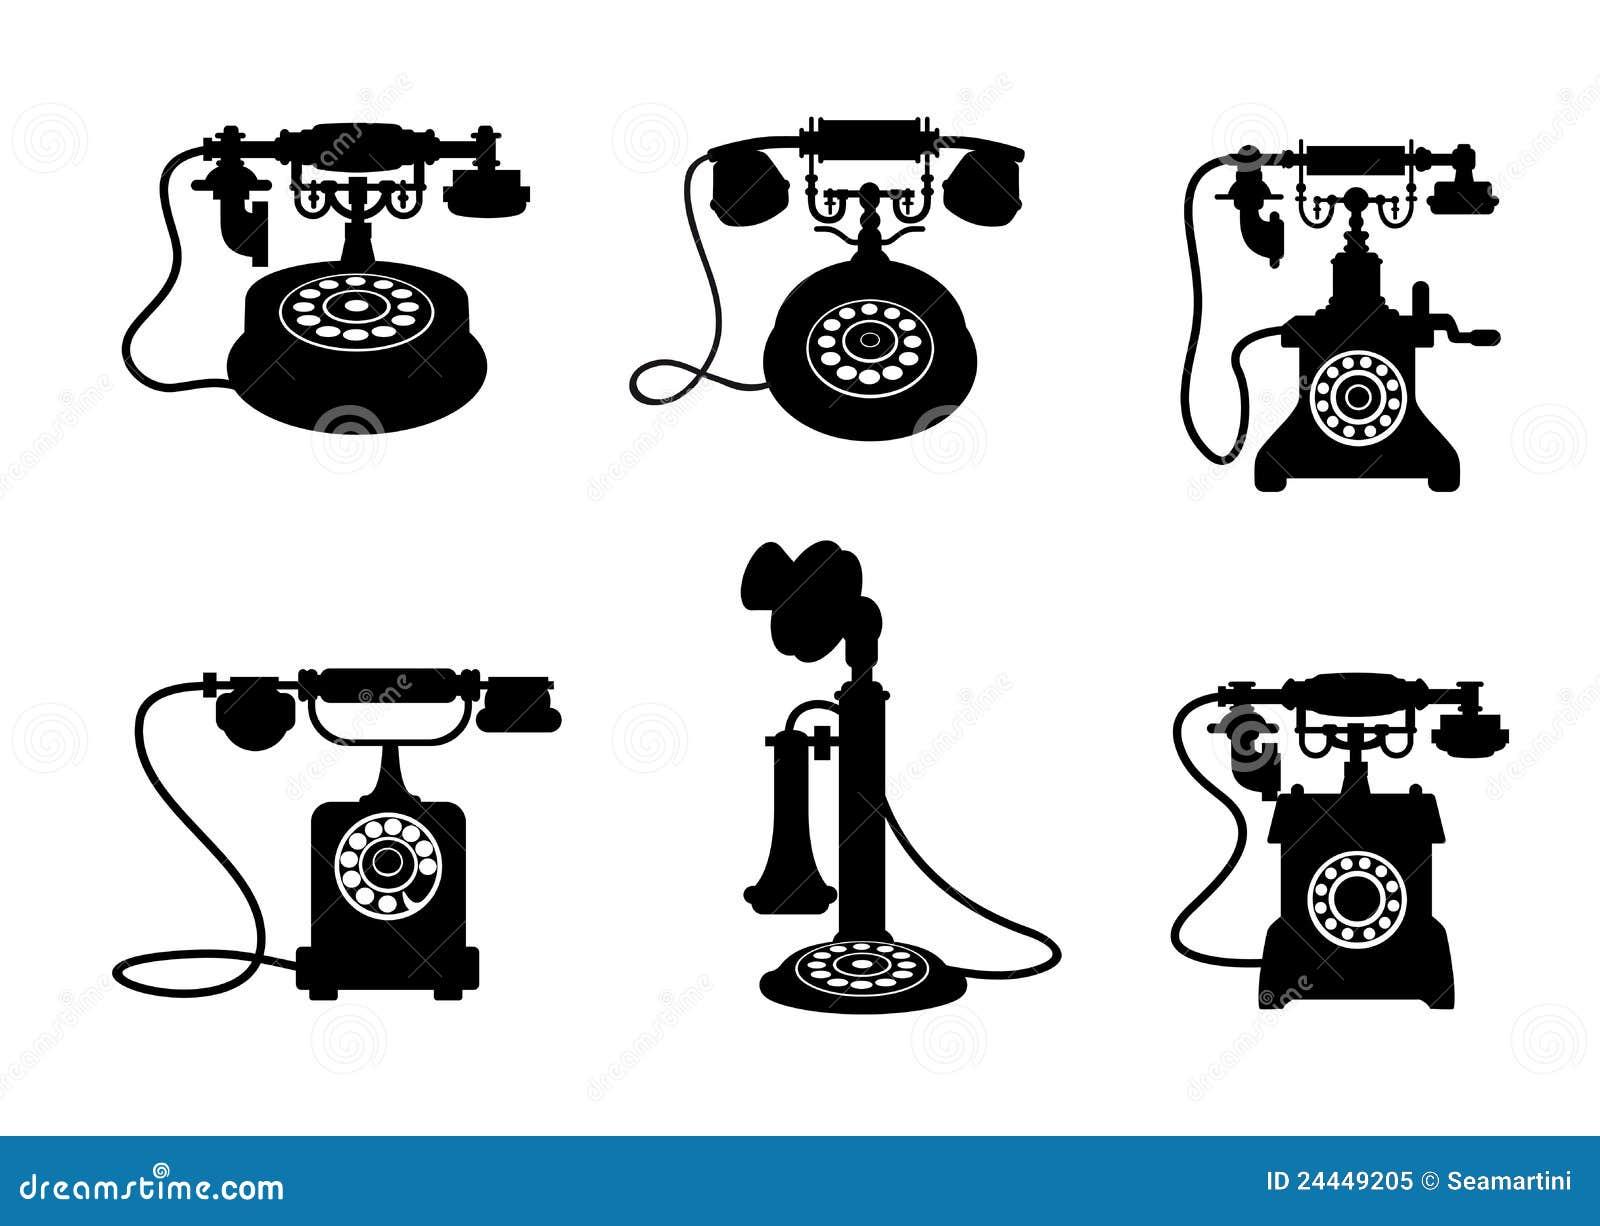 retro and vintage telephones royalty free stock photo